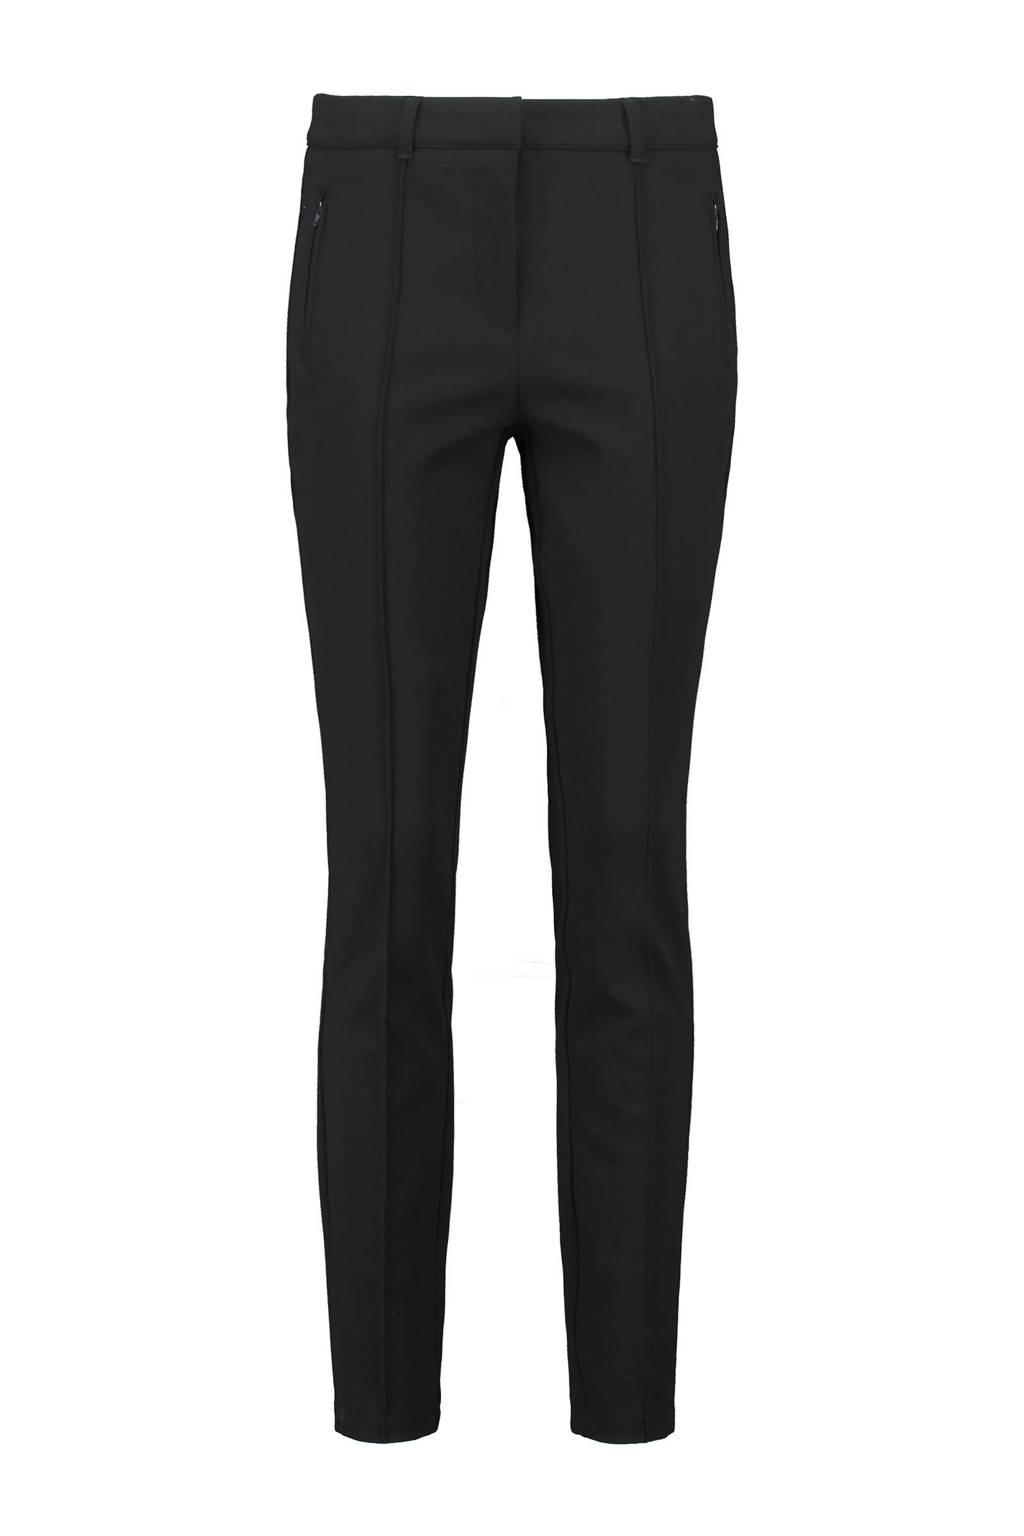 Expresso skinny pantalon zwart, Zwart